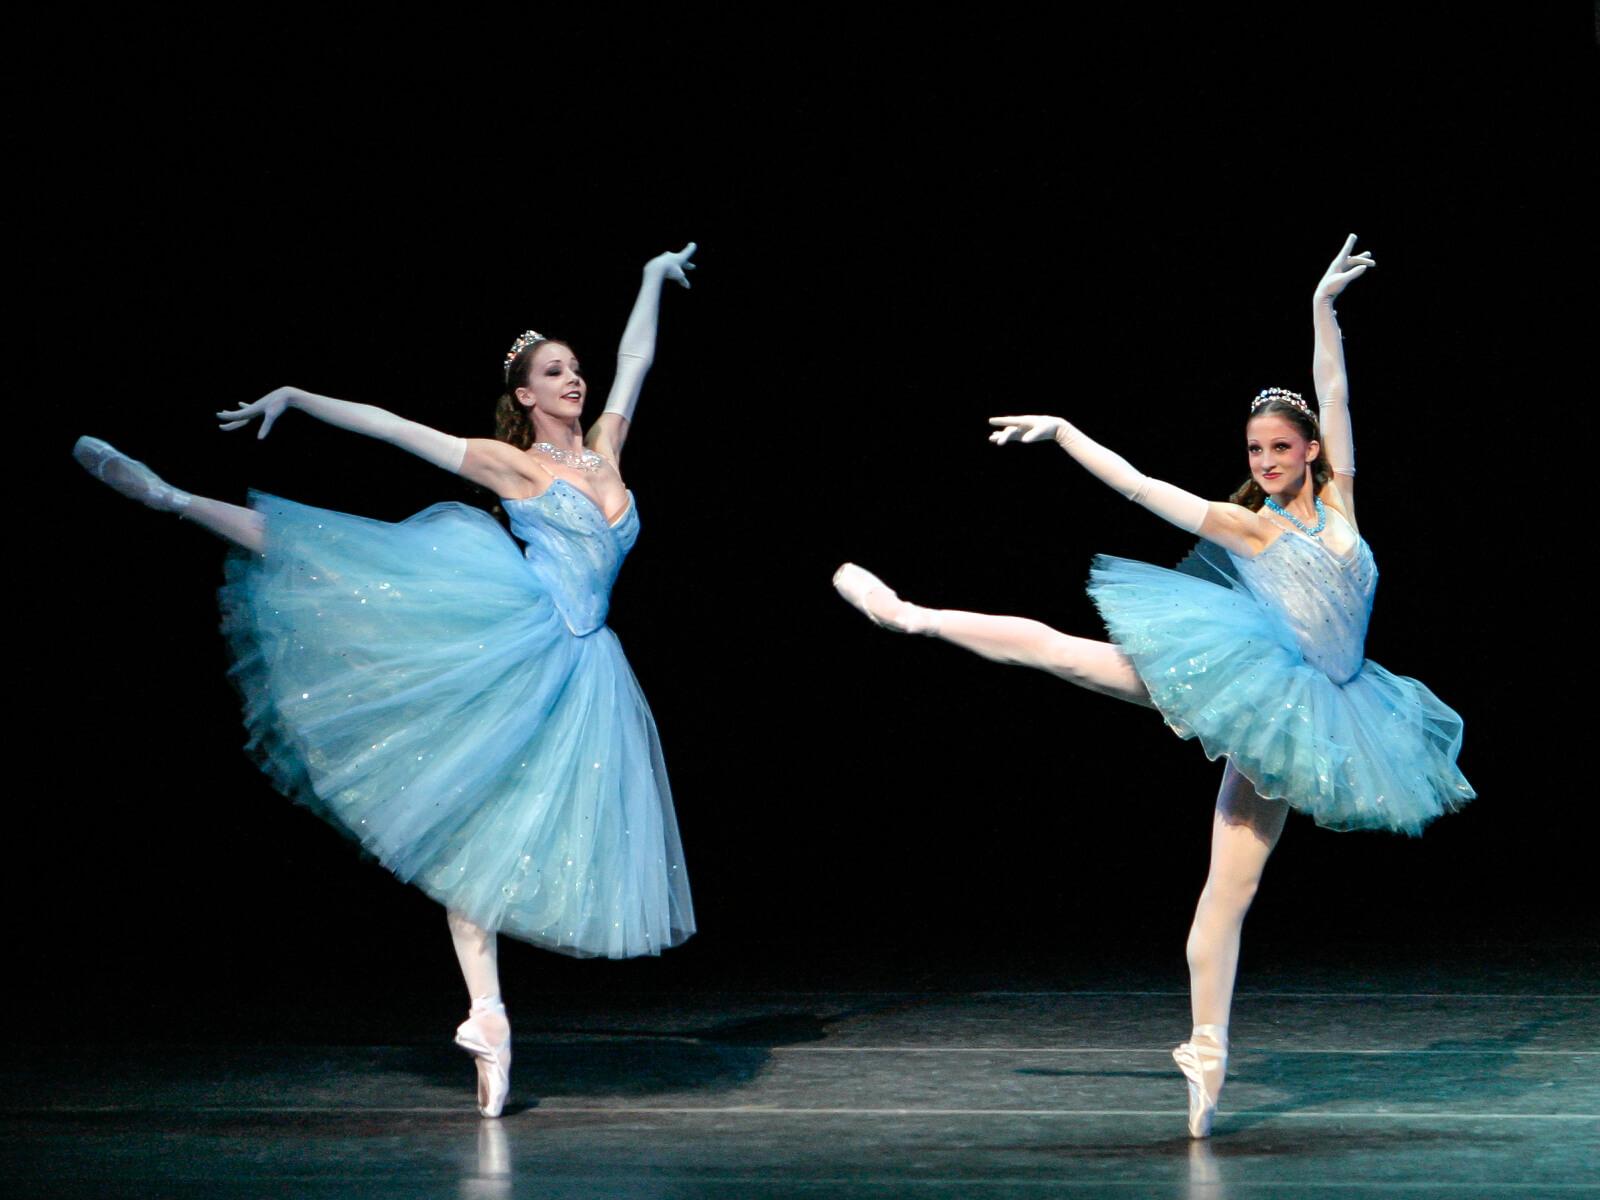 Maria Korowski and Ashley Bouder (both in blue tutus) dance in a pas de deux, captured in a back attitude en pointe.